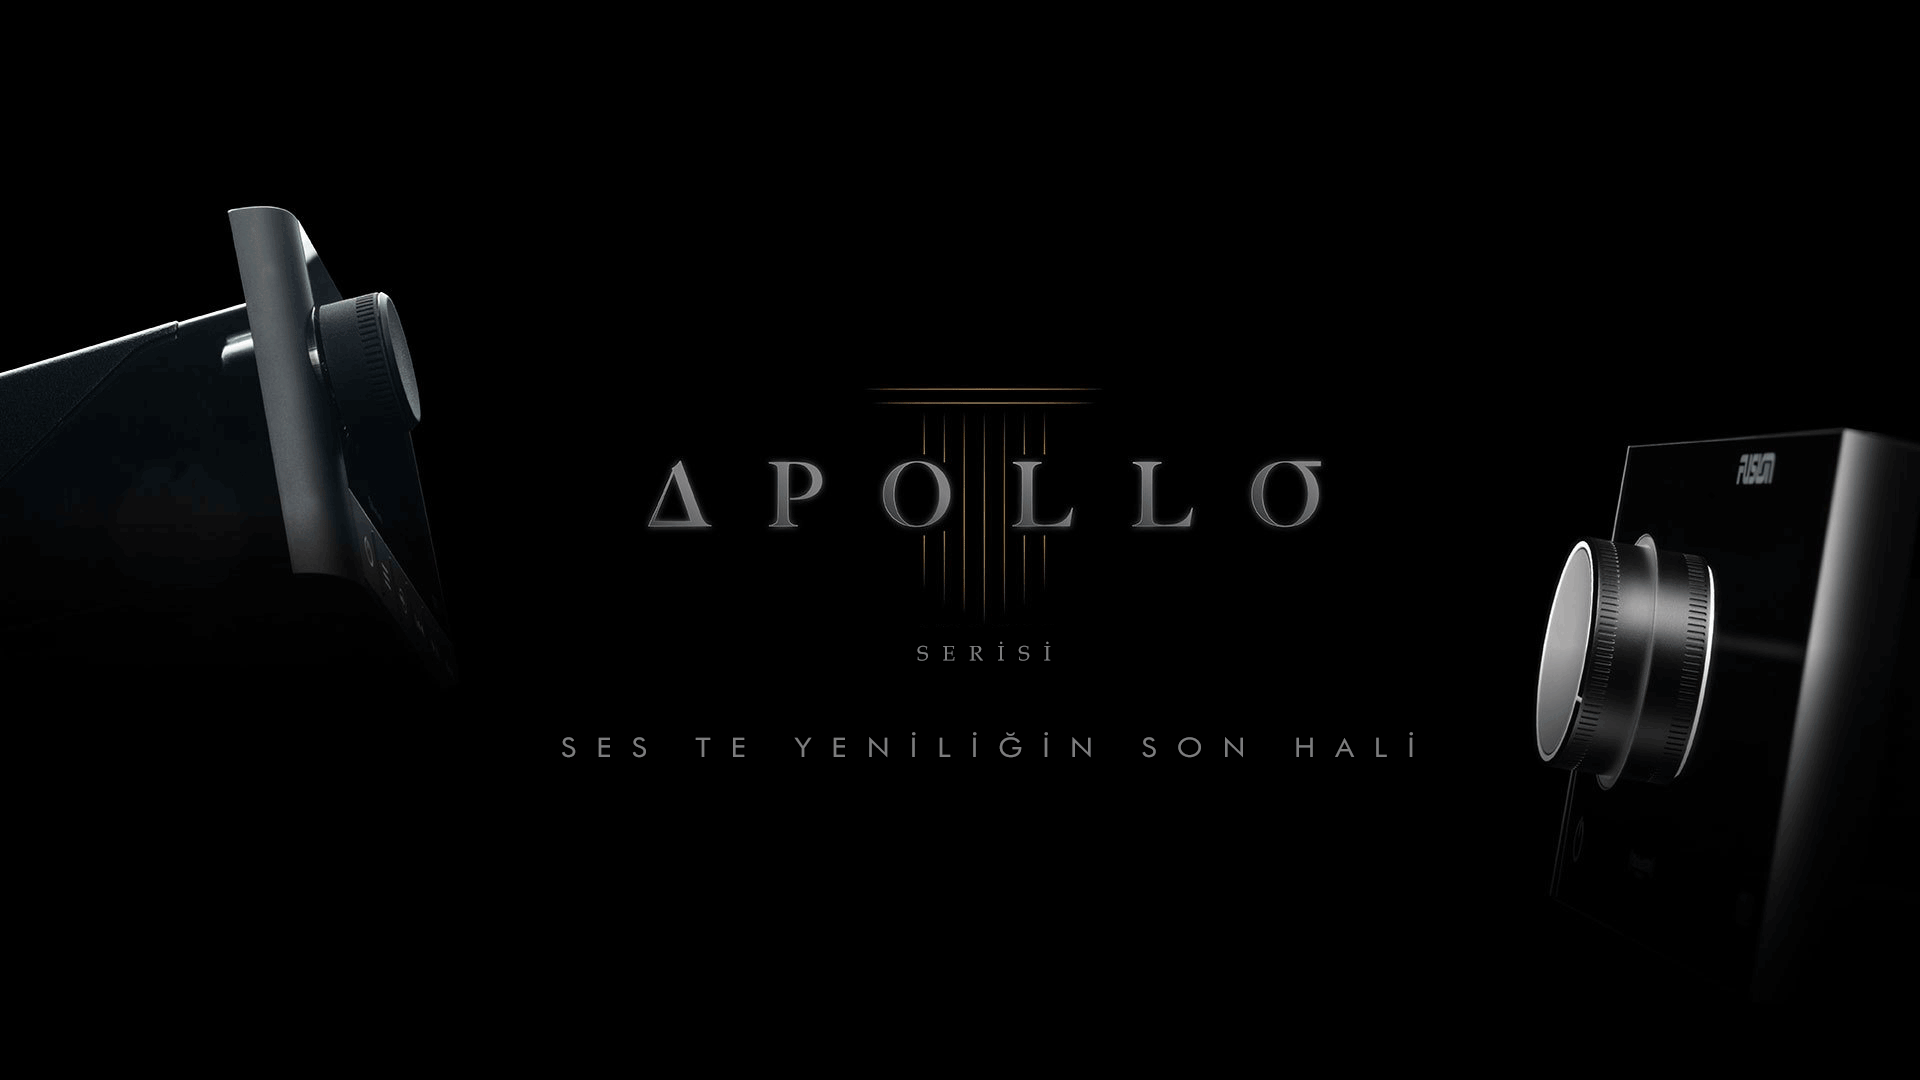 Apollo RA770